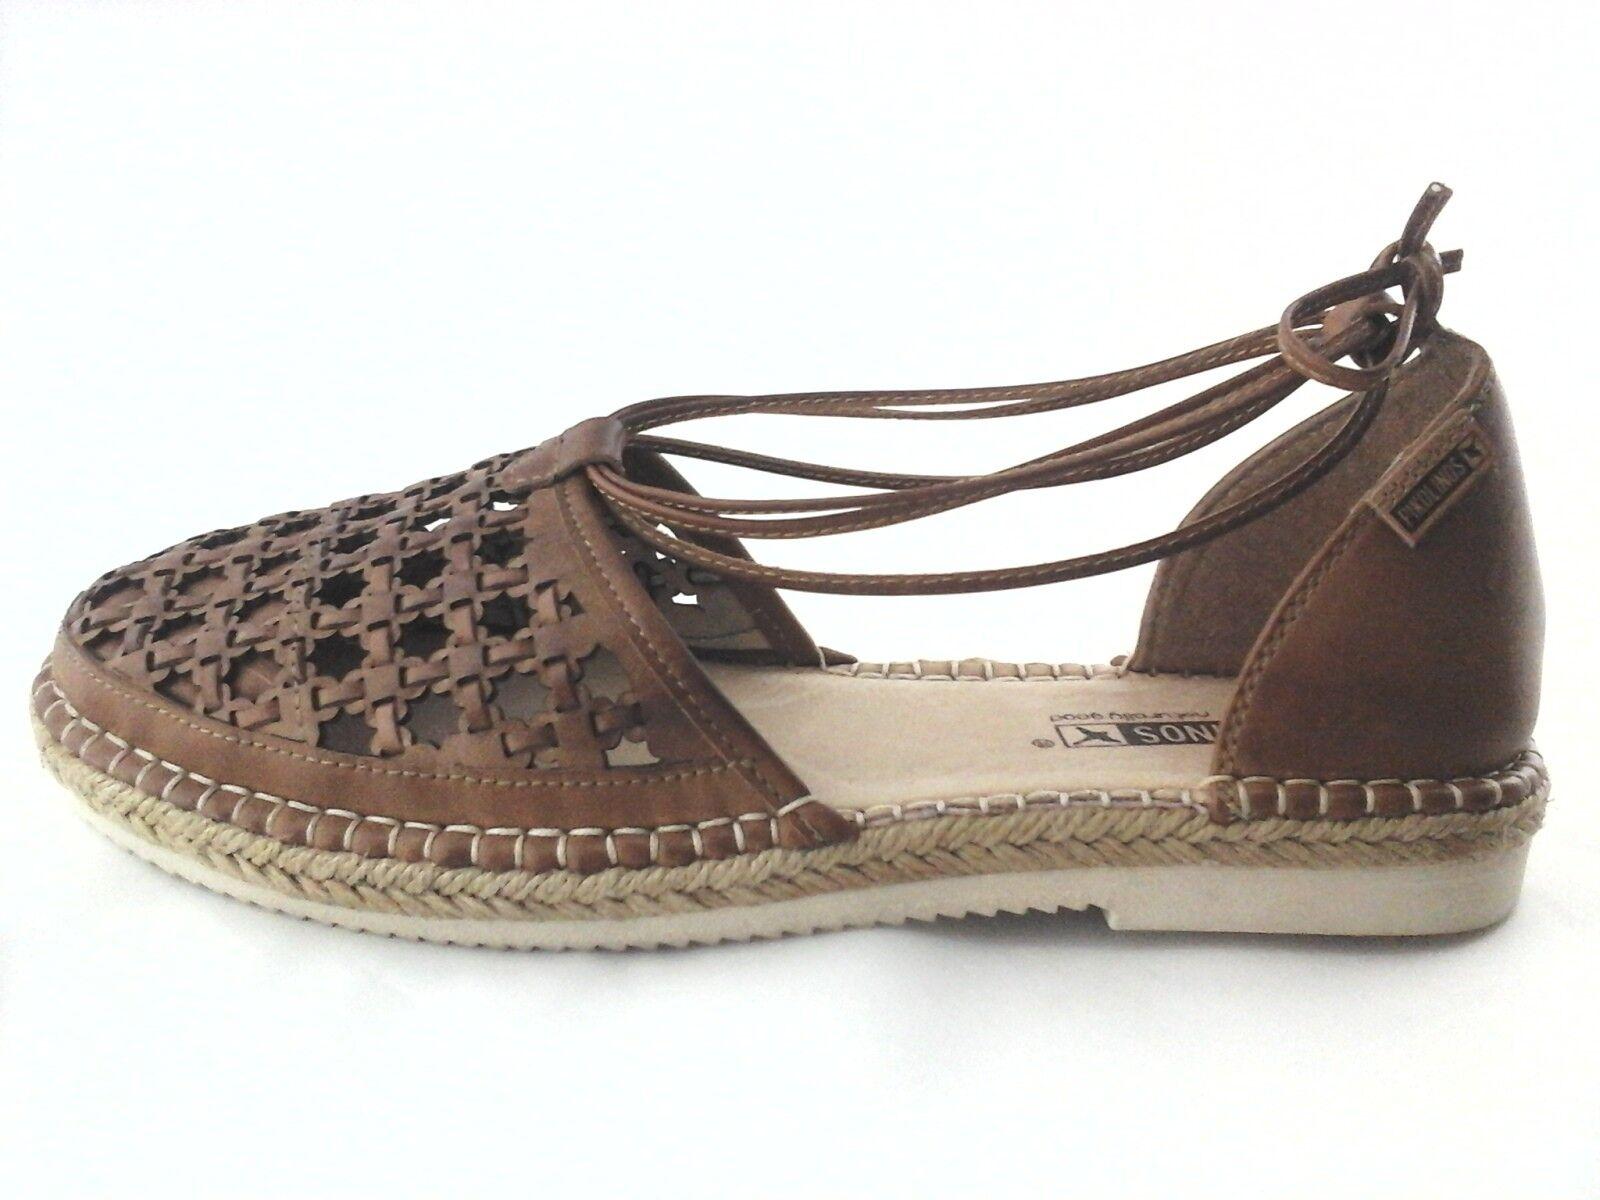 PIKOLINOS Sandals Cadamunt Tan Woven Espadrilles Women's US 8.5 9 EU 39  175